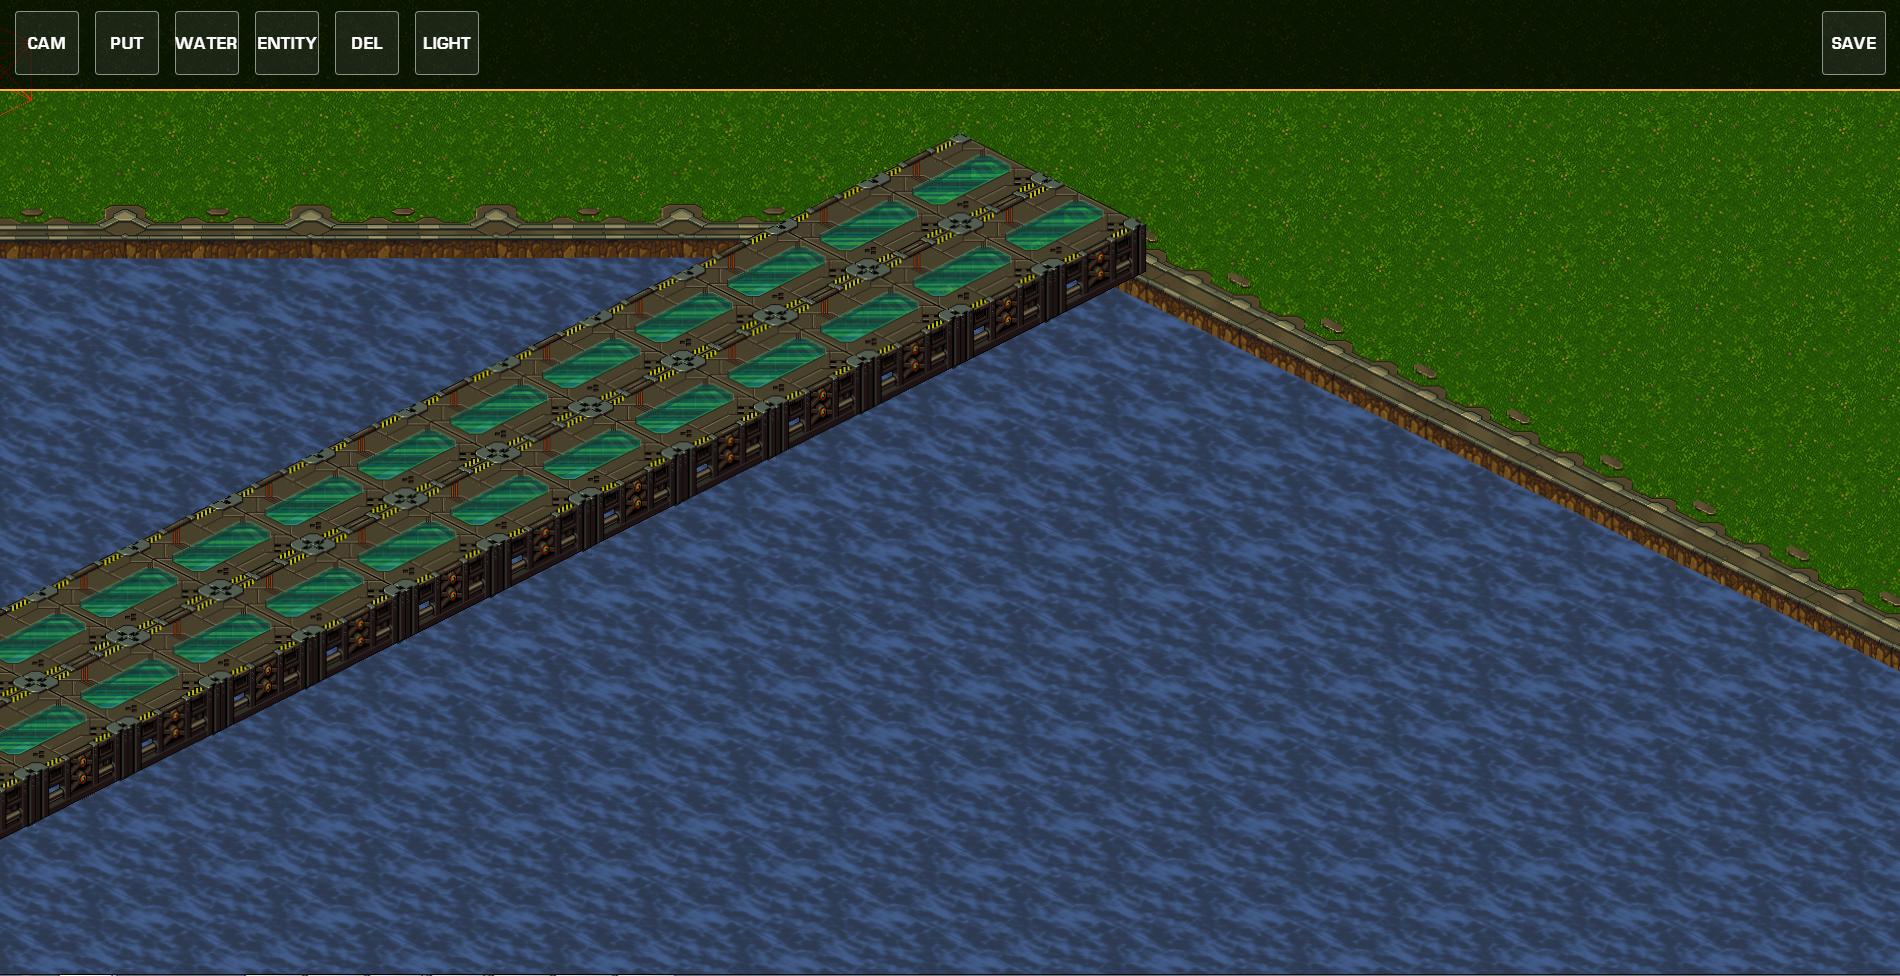 Antraxx game screenshot